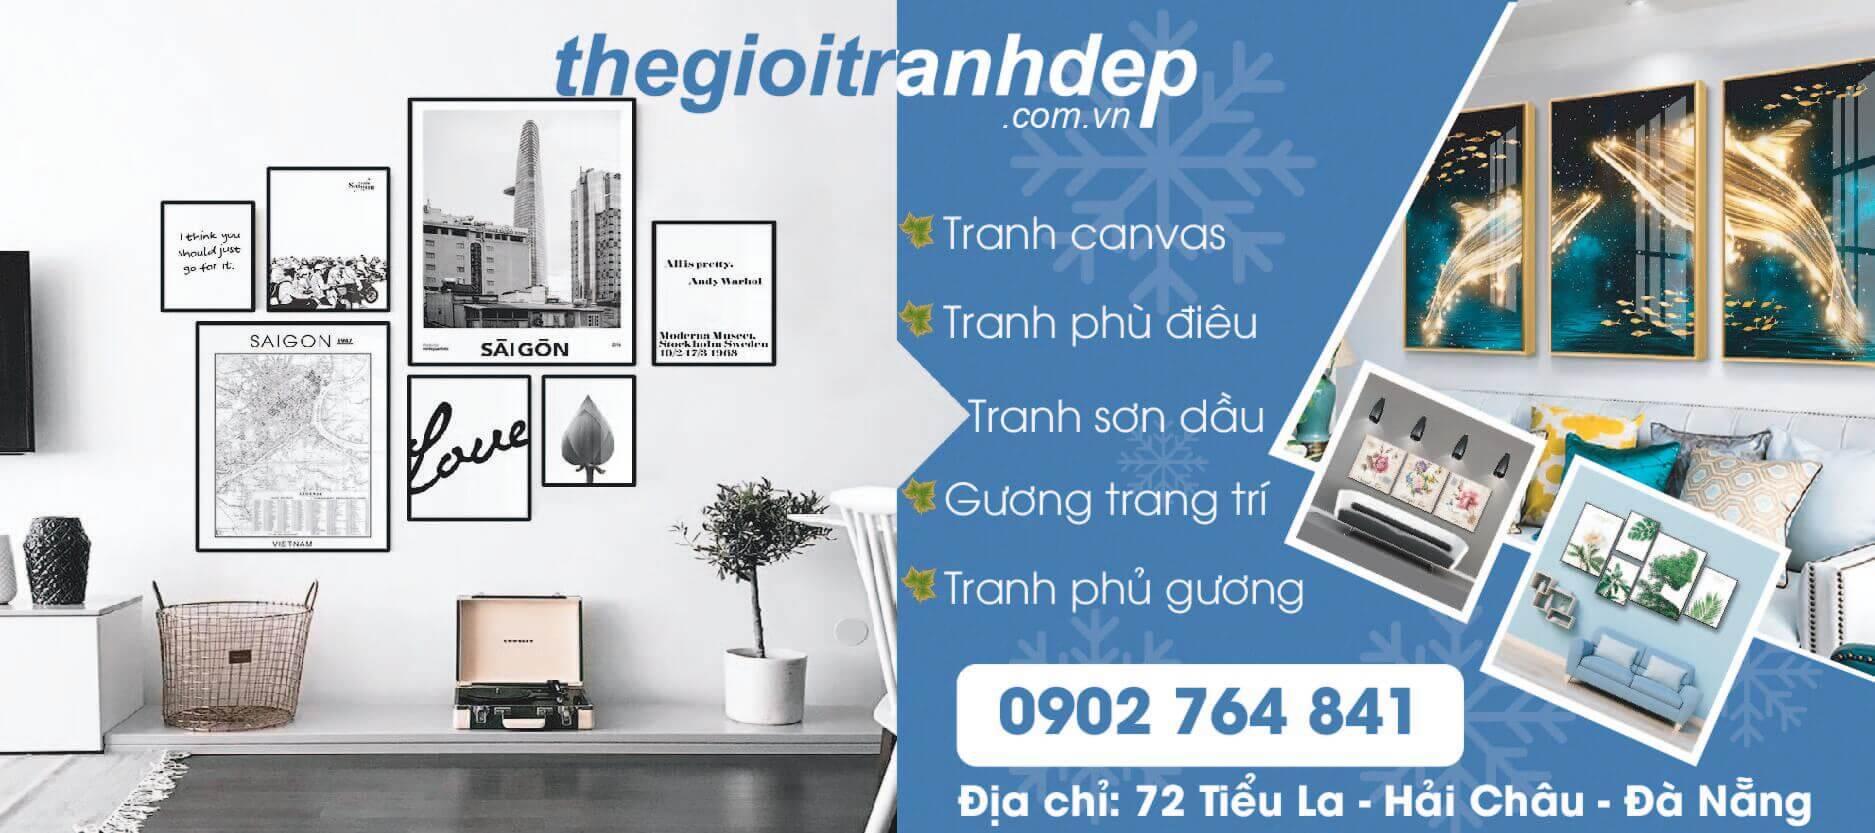 thegioitranhdep02